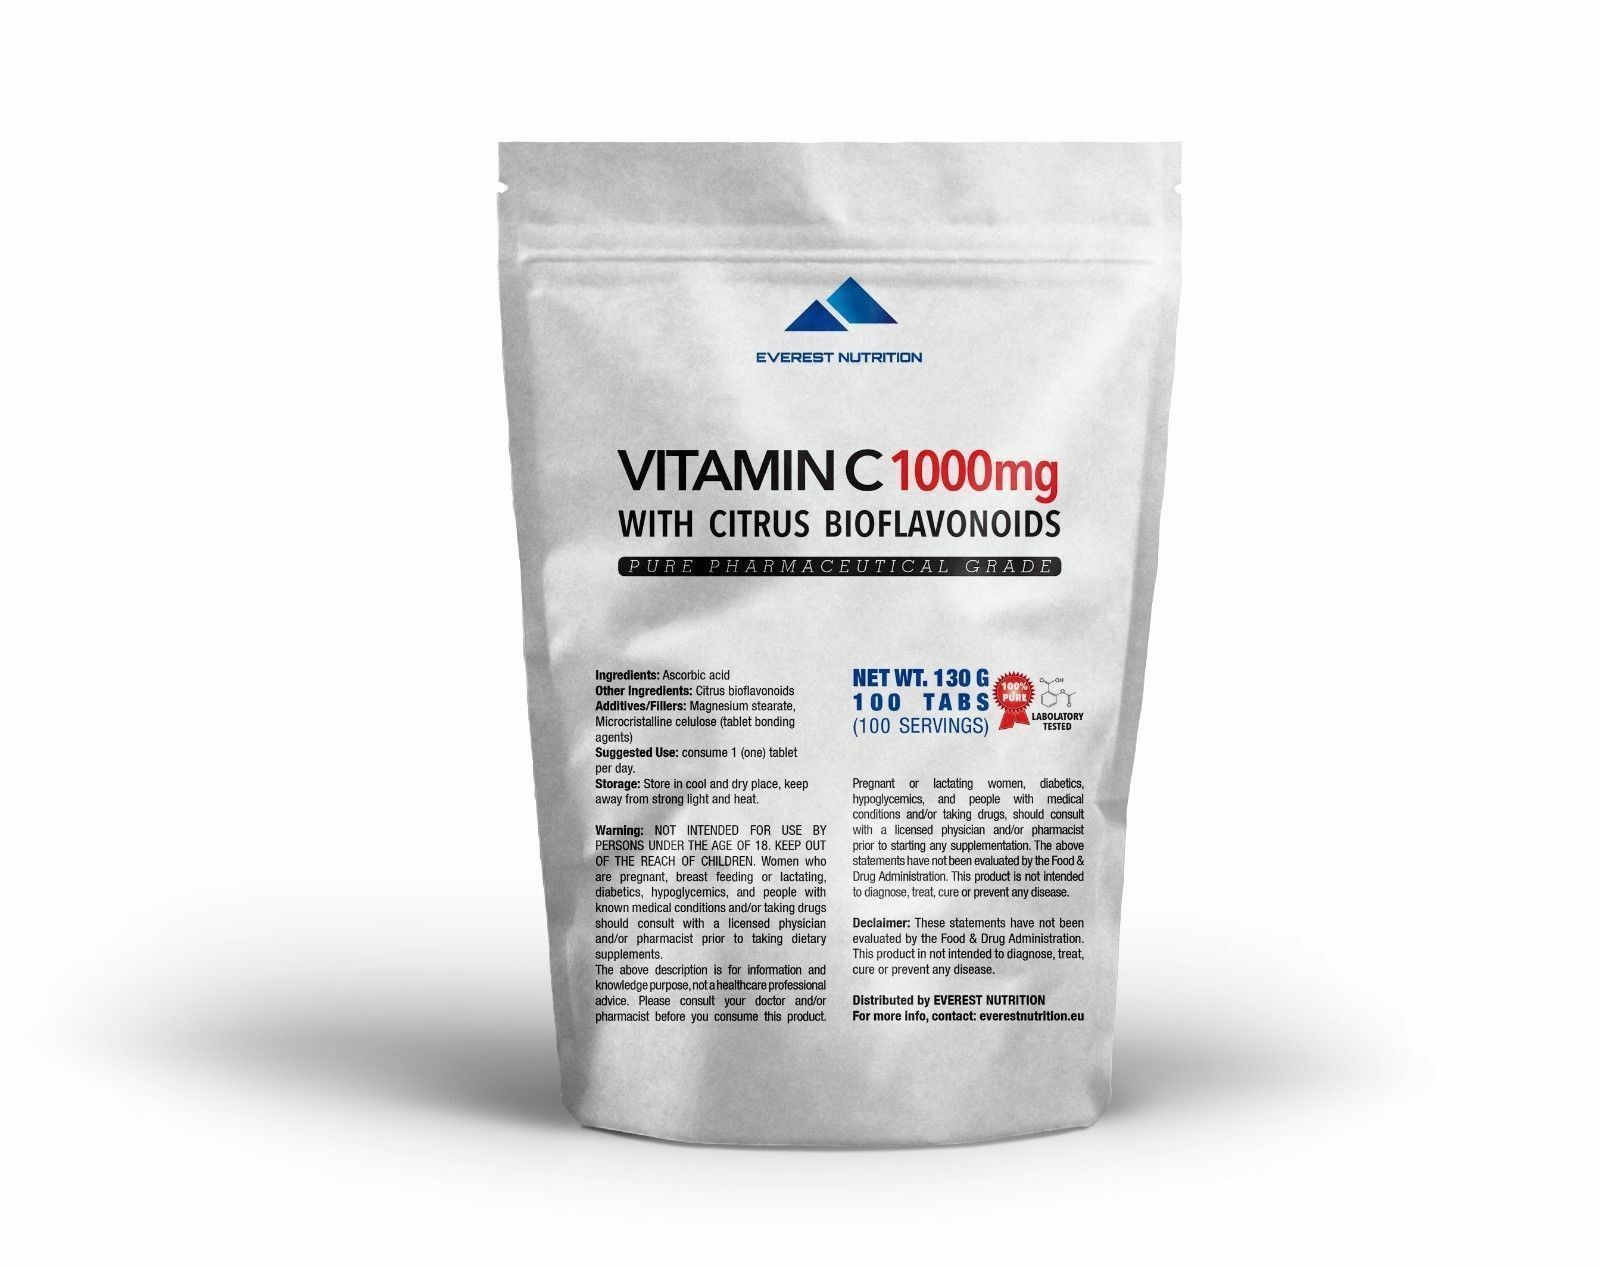 www.LaBotika.es ✅ ▷ Ácido ascarbico ✅ Vitamina C 1000 mg.